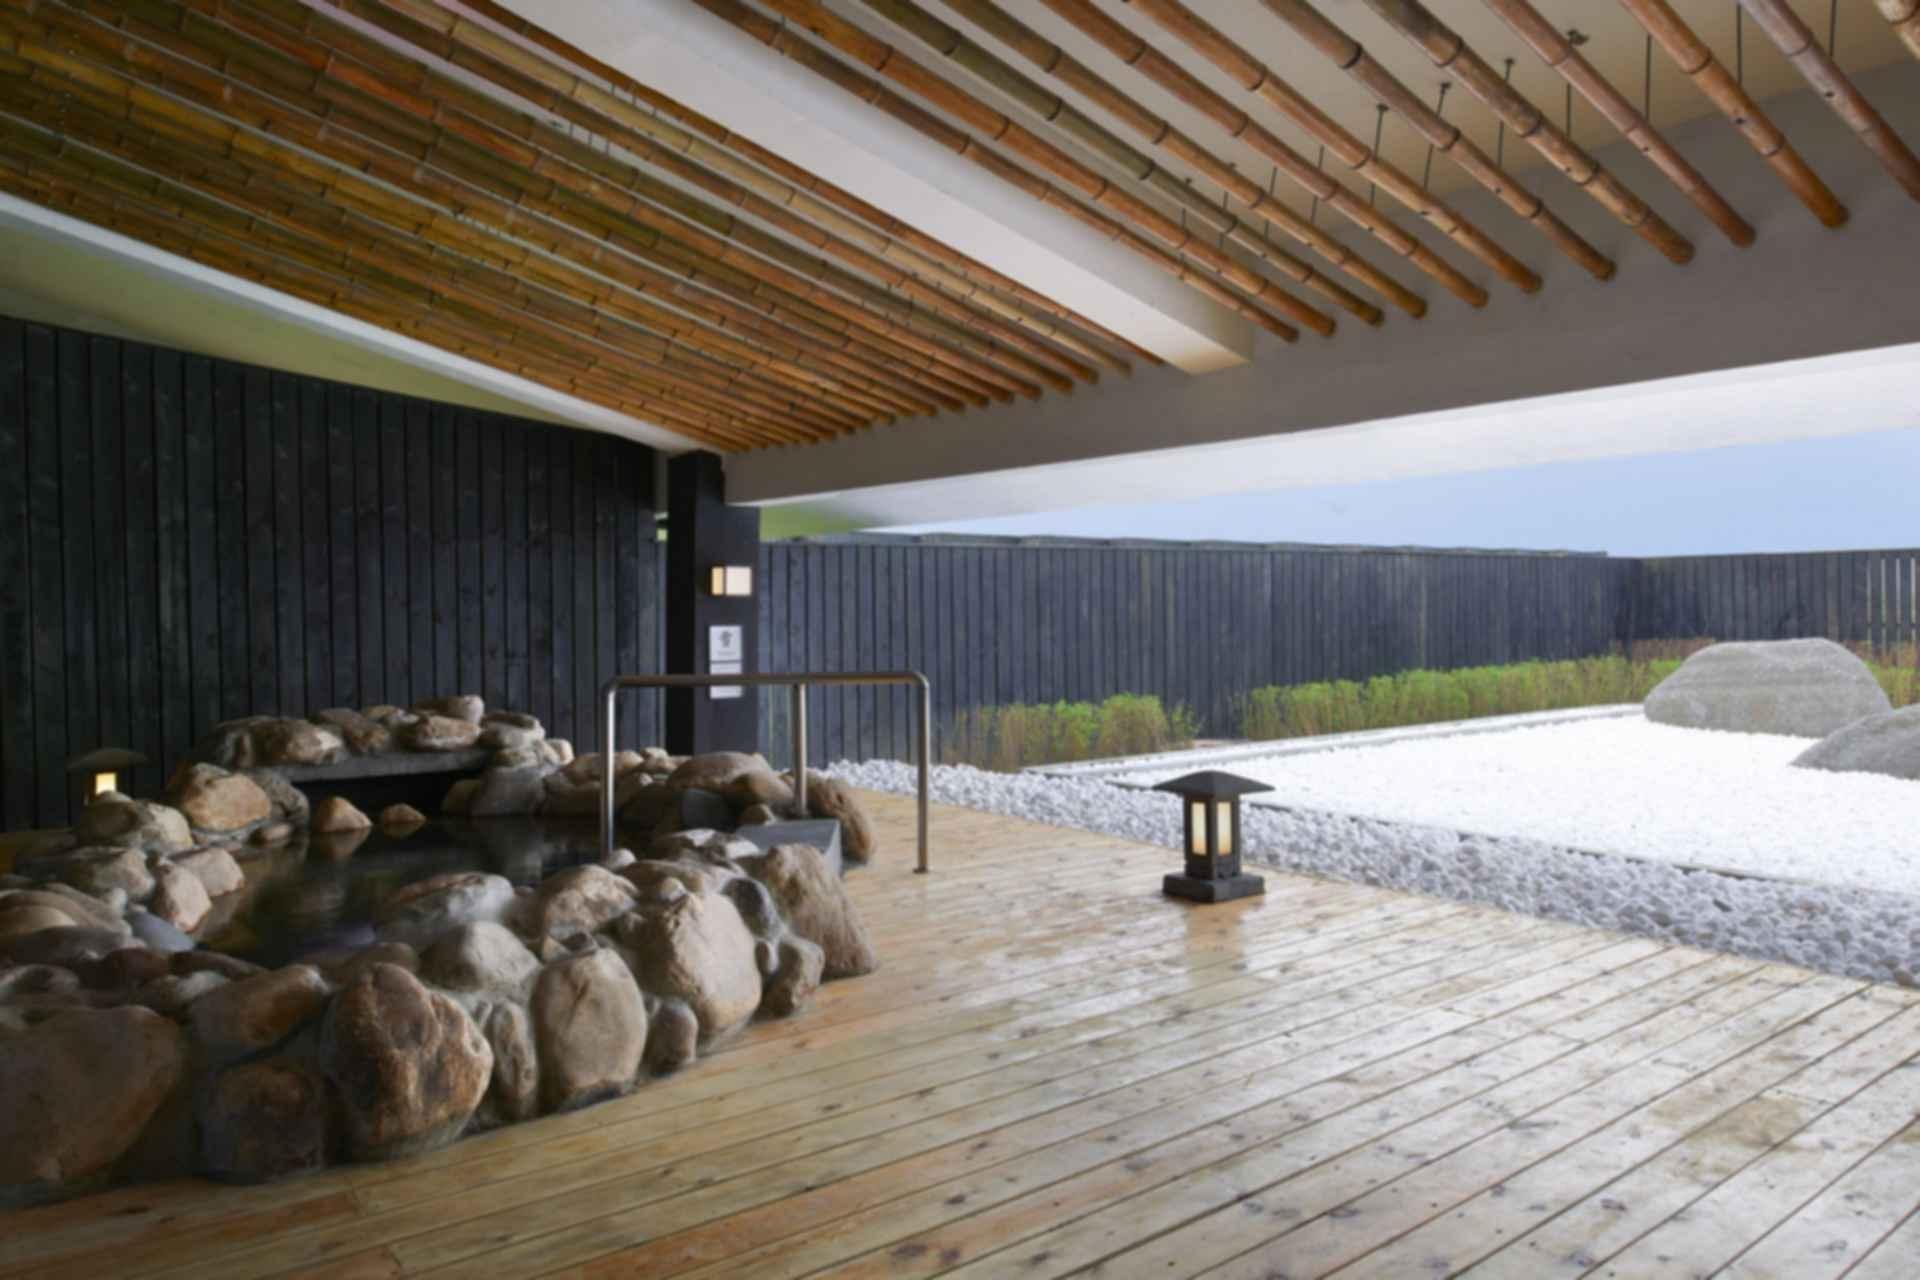 Qiqihaer Hezhitang Hot Spring - Spa